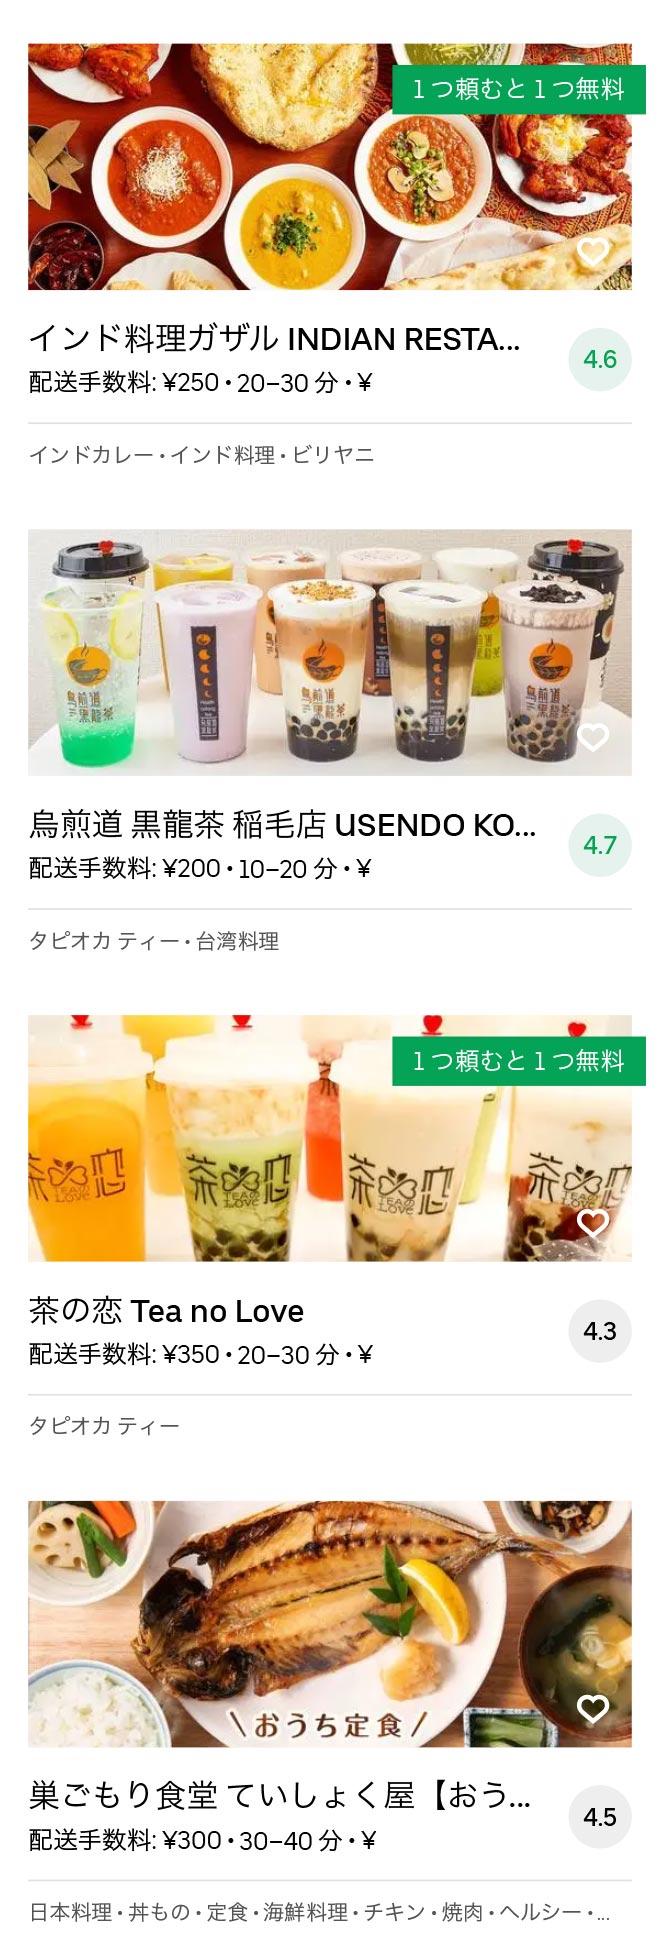 Inage menu 2010 11